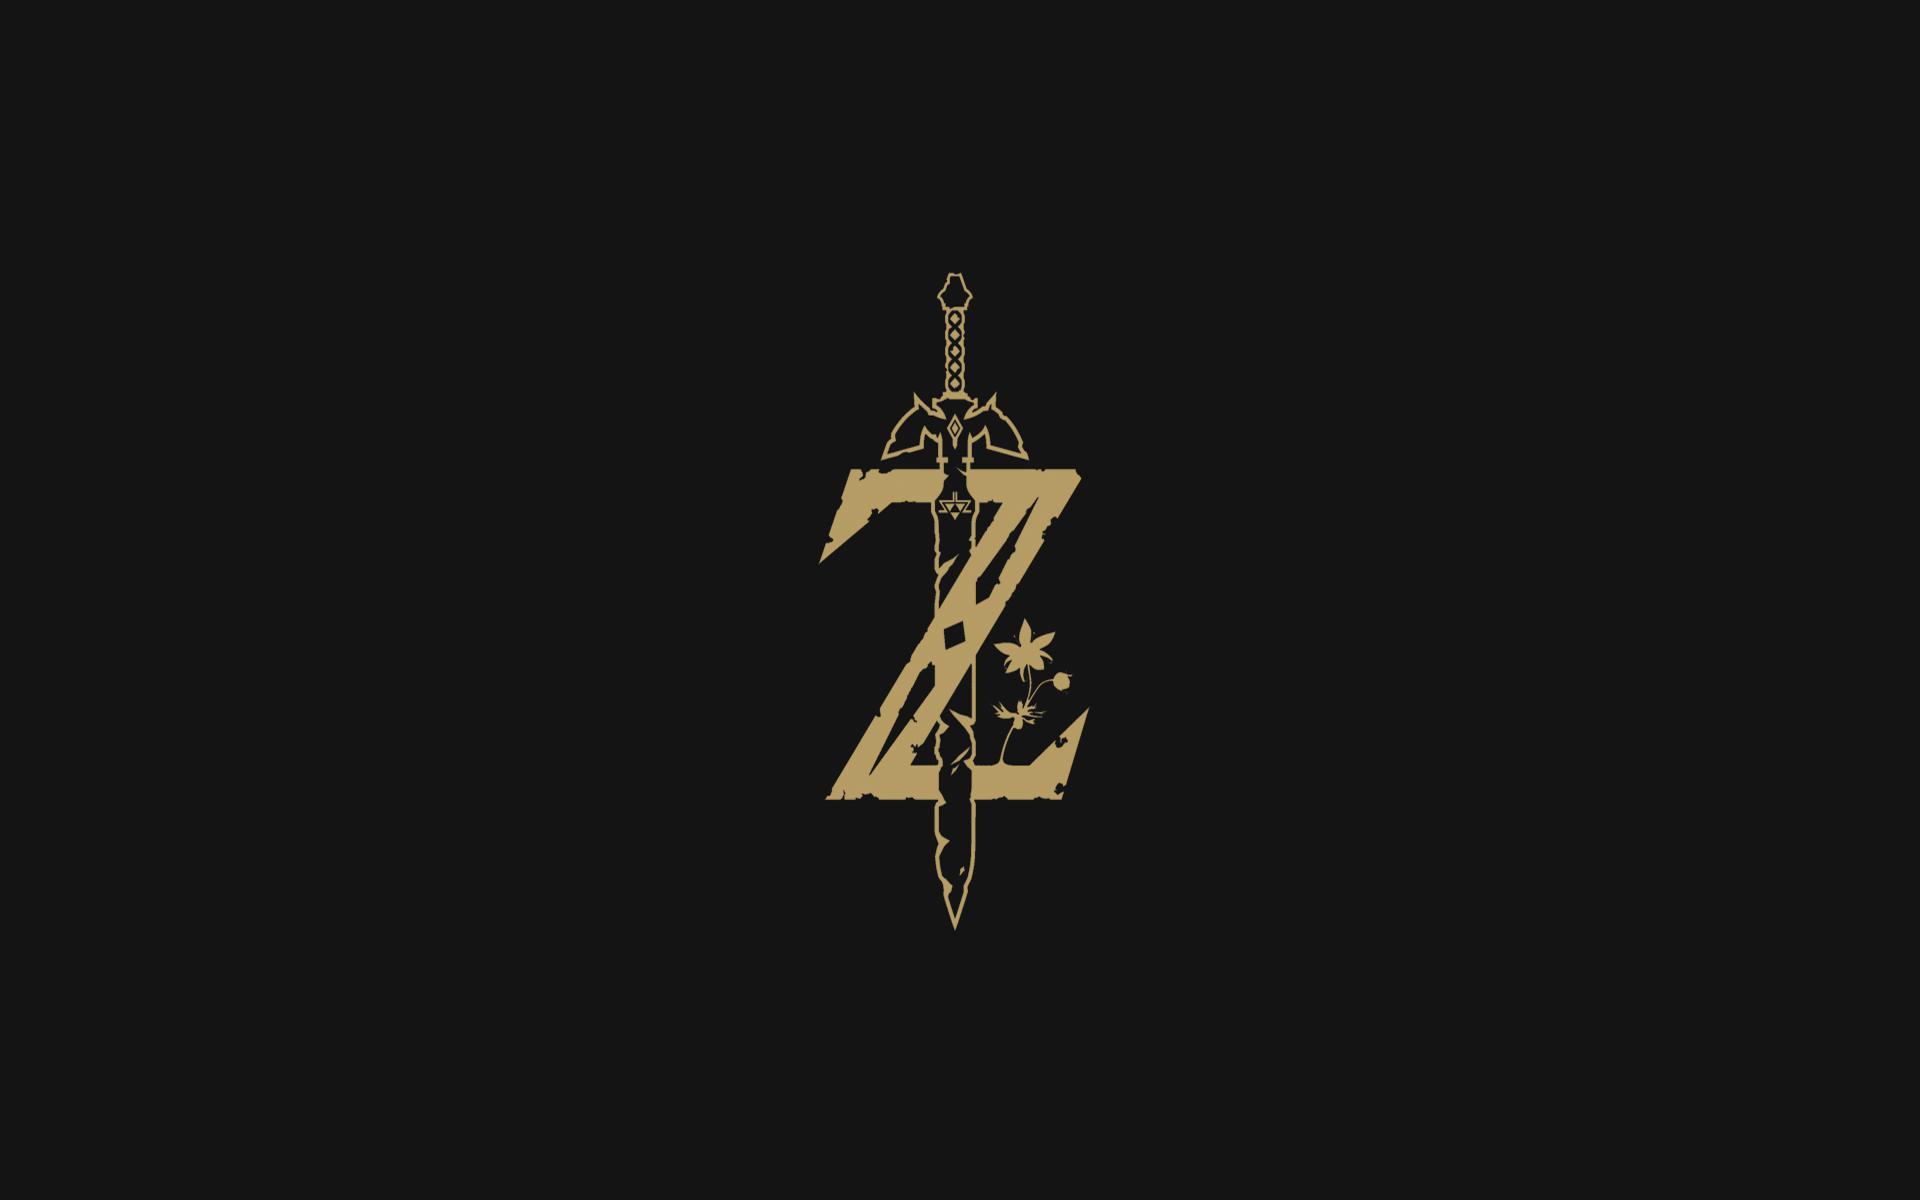 zelda logo hd wallpaper from gallsourcecom